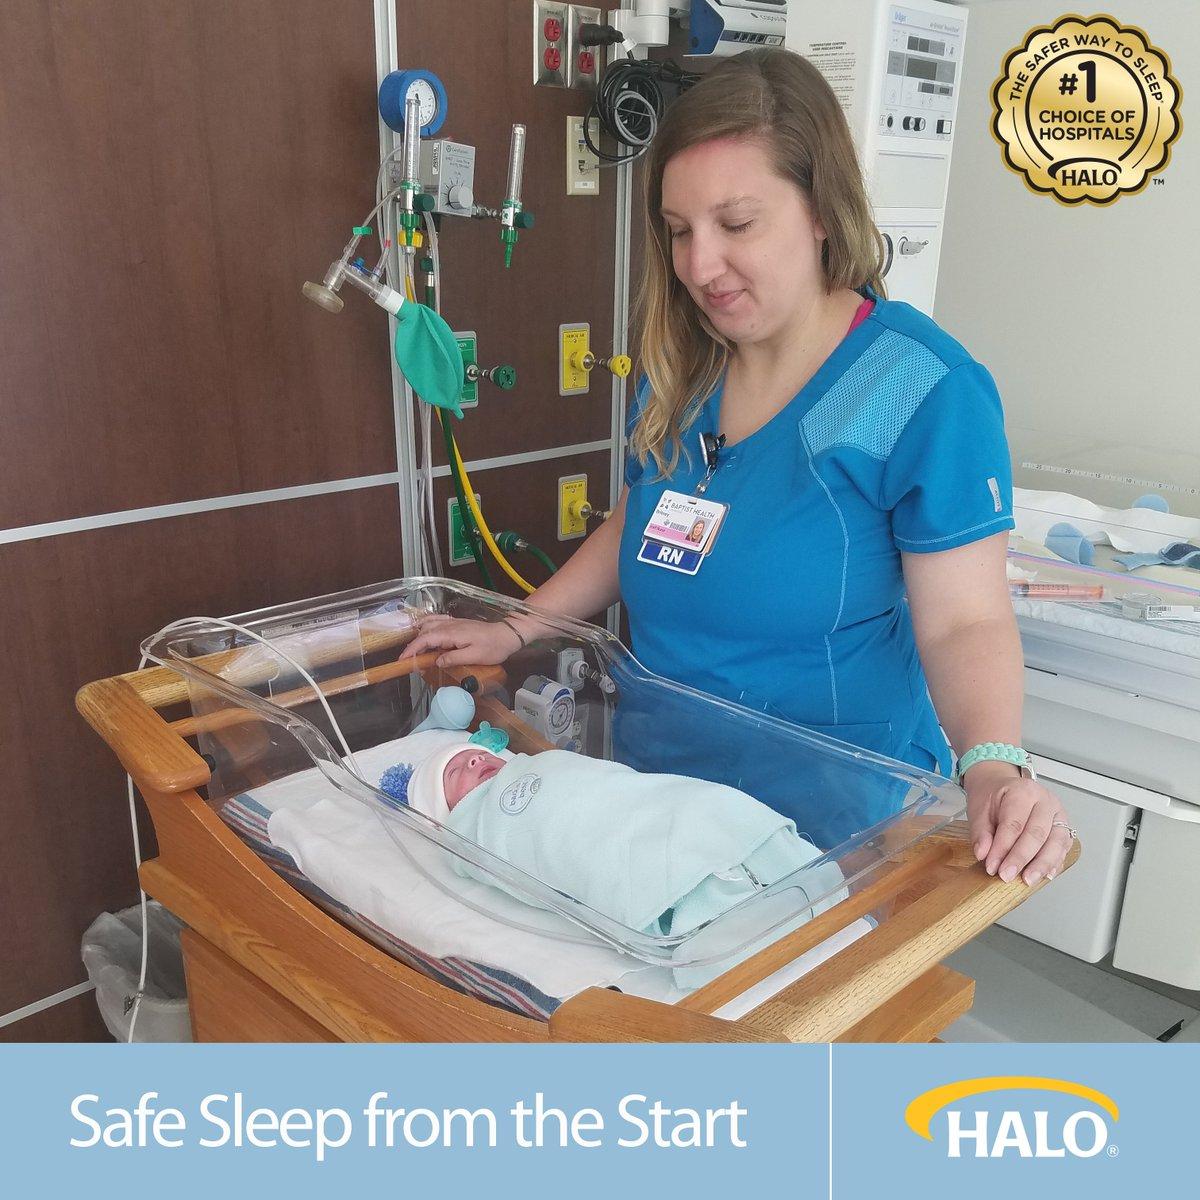 Over 1,400 hospitals use the #HALOSleepSack. The safest way for baby to sleep from the start https://t.co/cbQDHfyu2o https://t.co/0x4izCMO2f